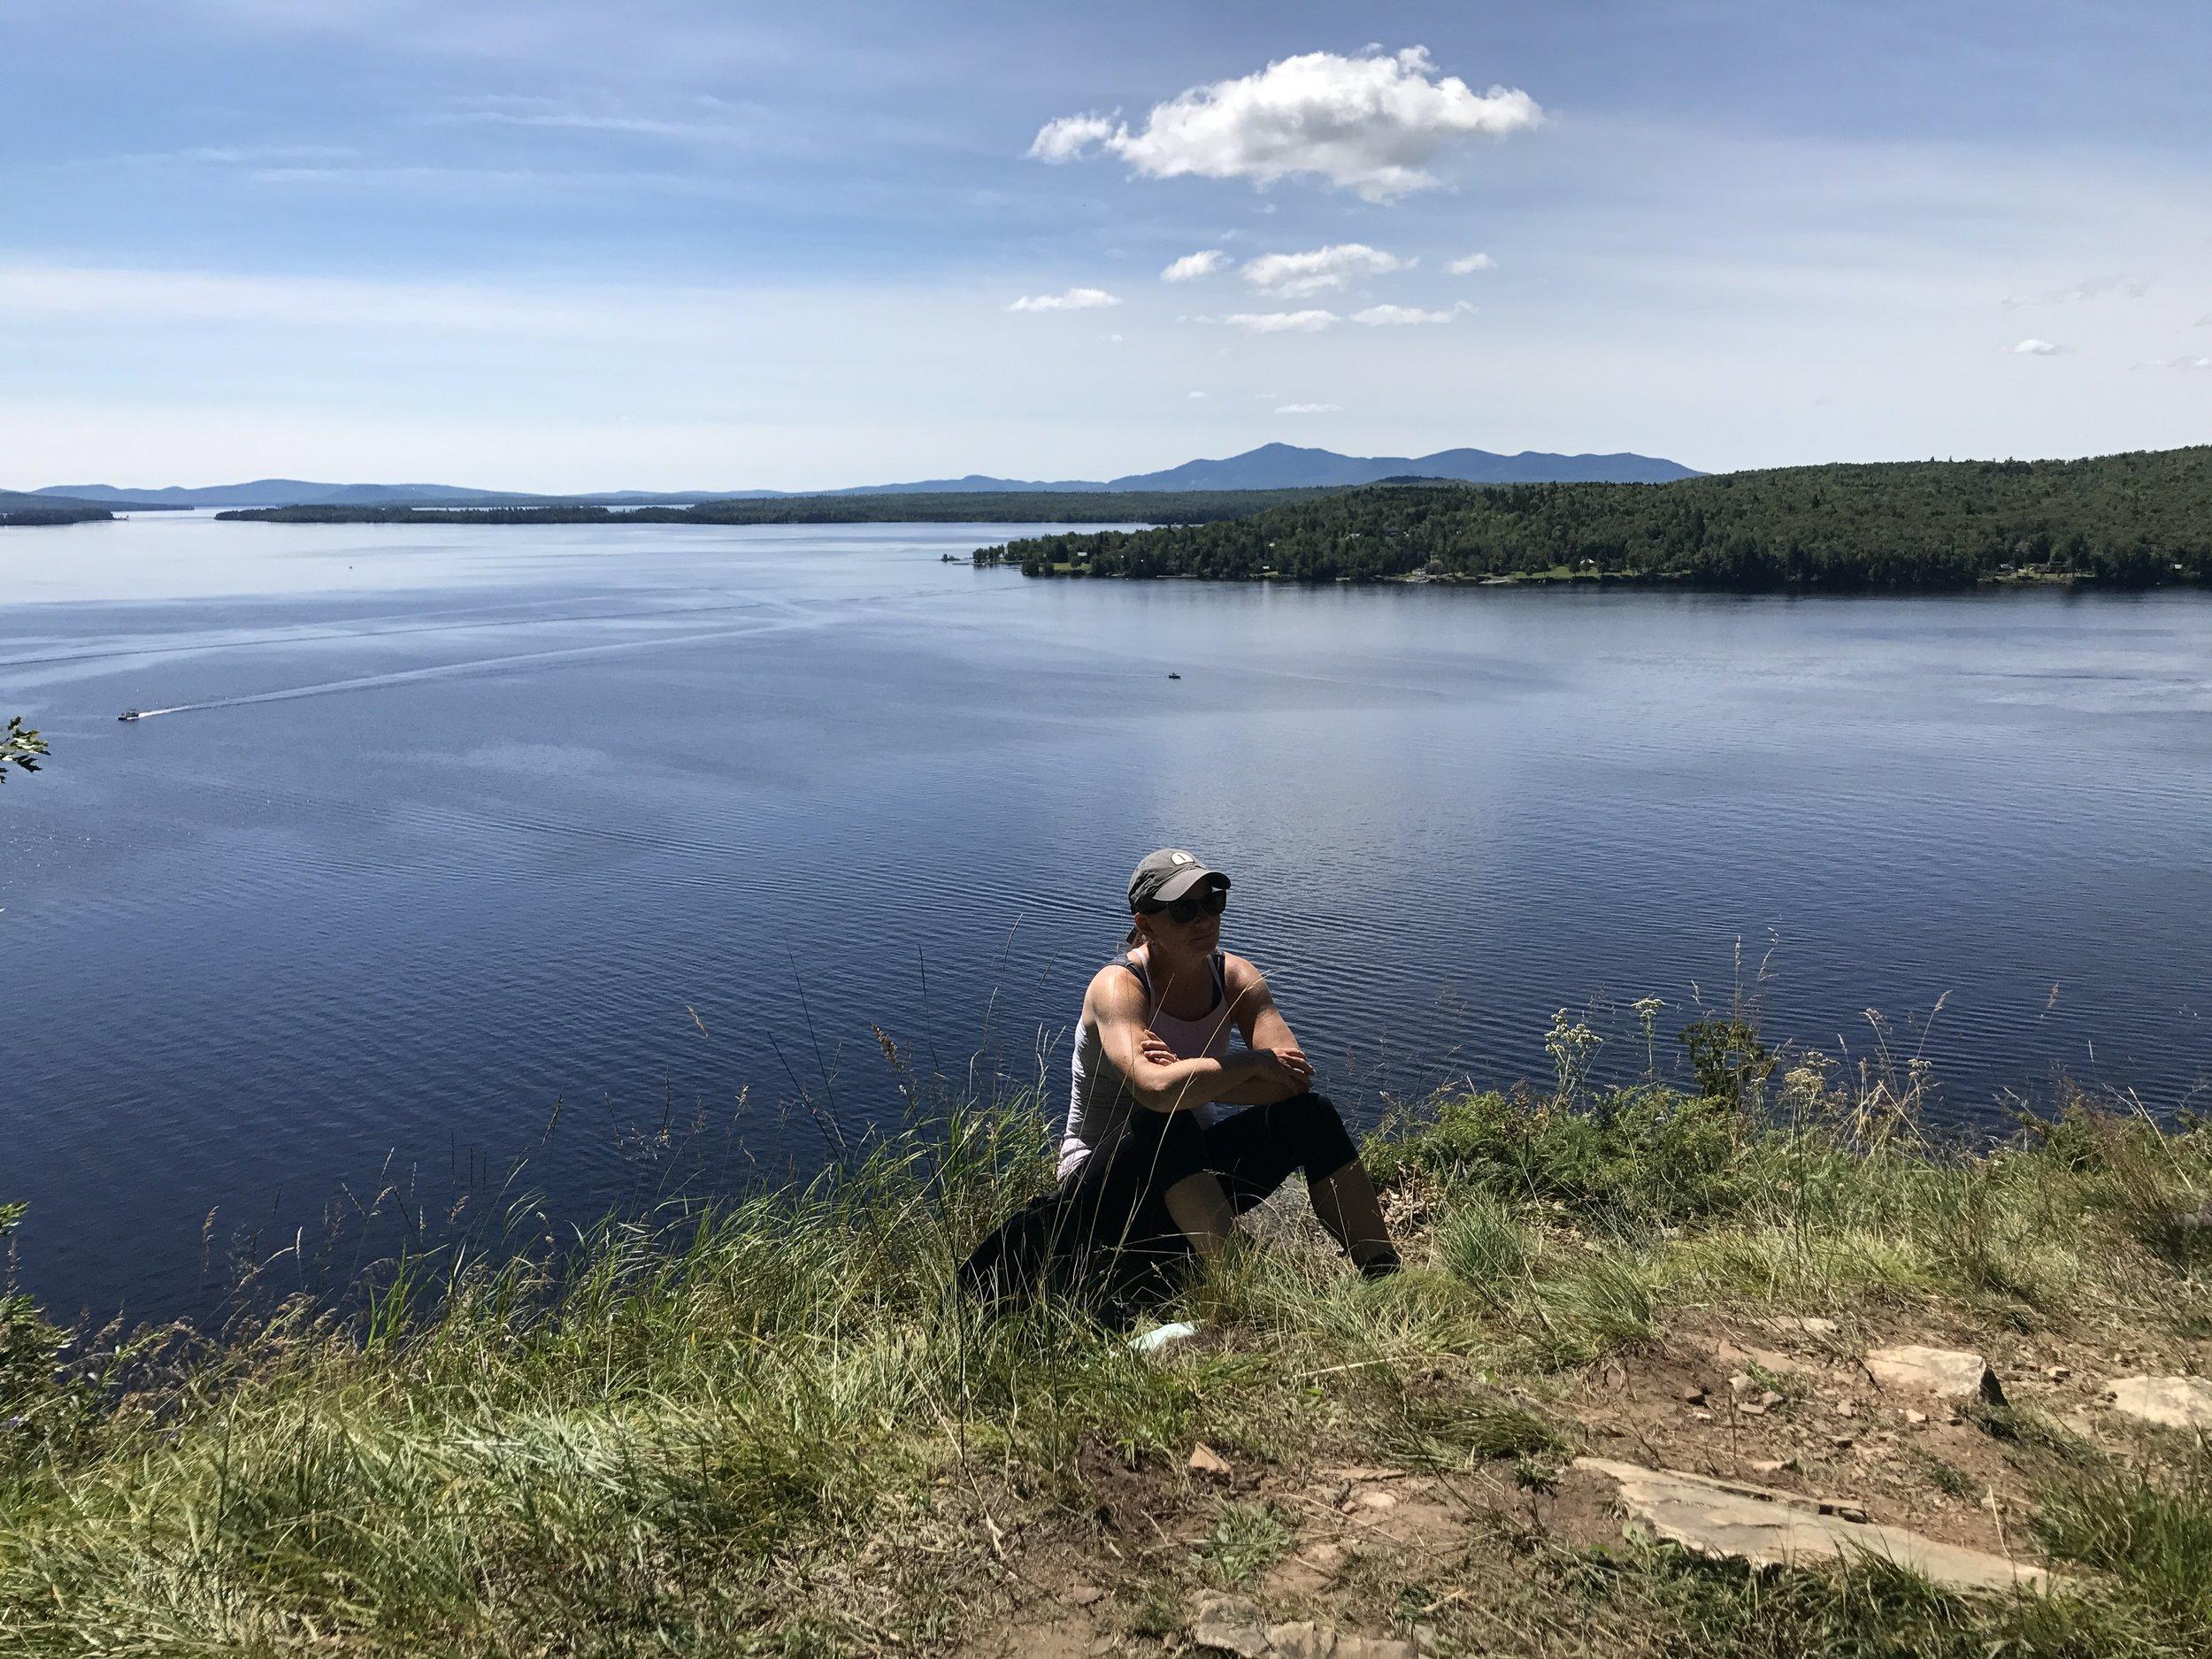 We will climb Mt. Kineo, a stunning mountain in the heart of Moosehead Lake!